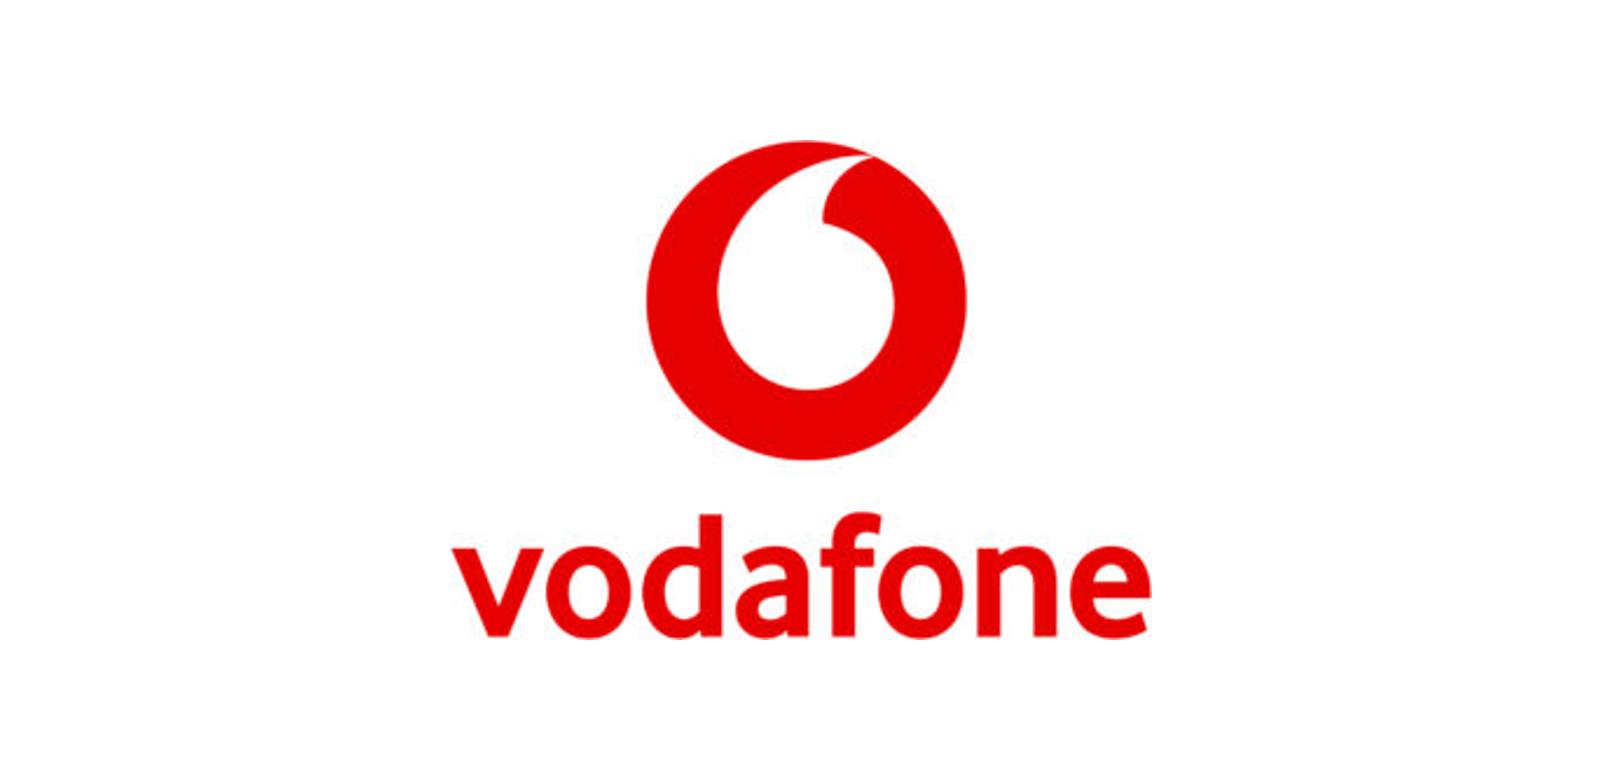 https://drcltd.co.uk/wp-content/uploads/2021/04/Vodafone-1.png